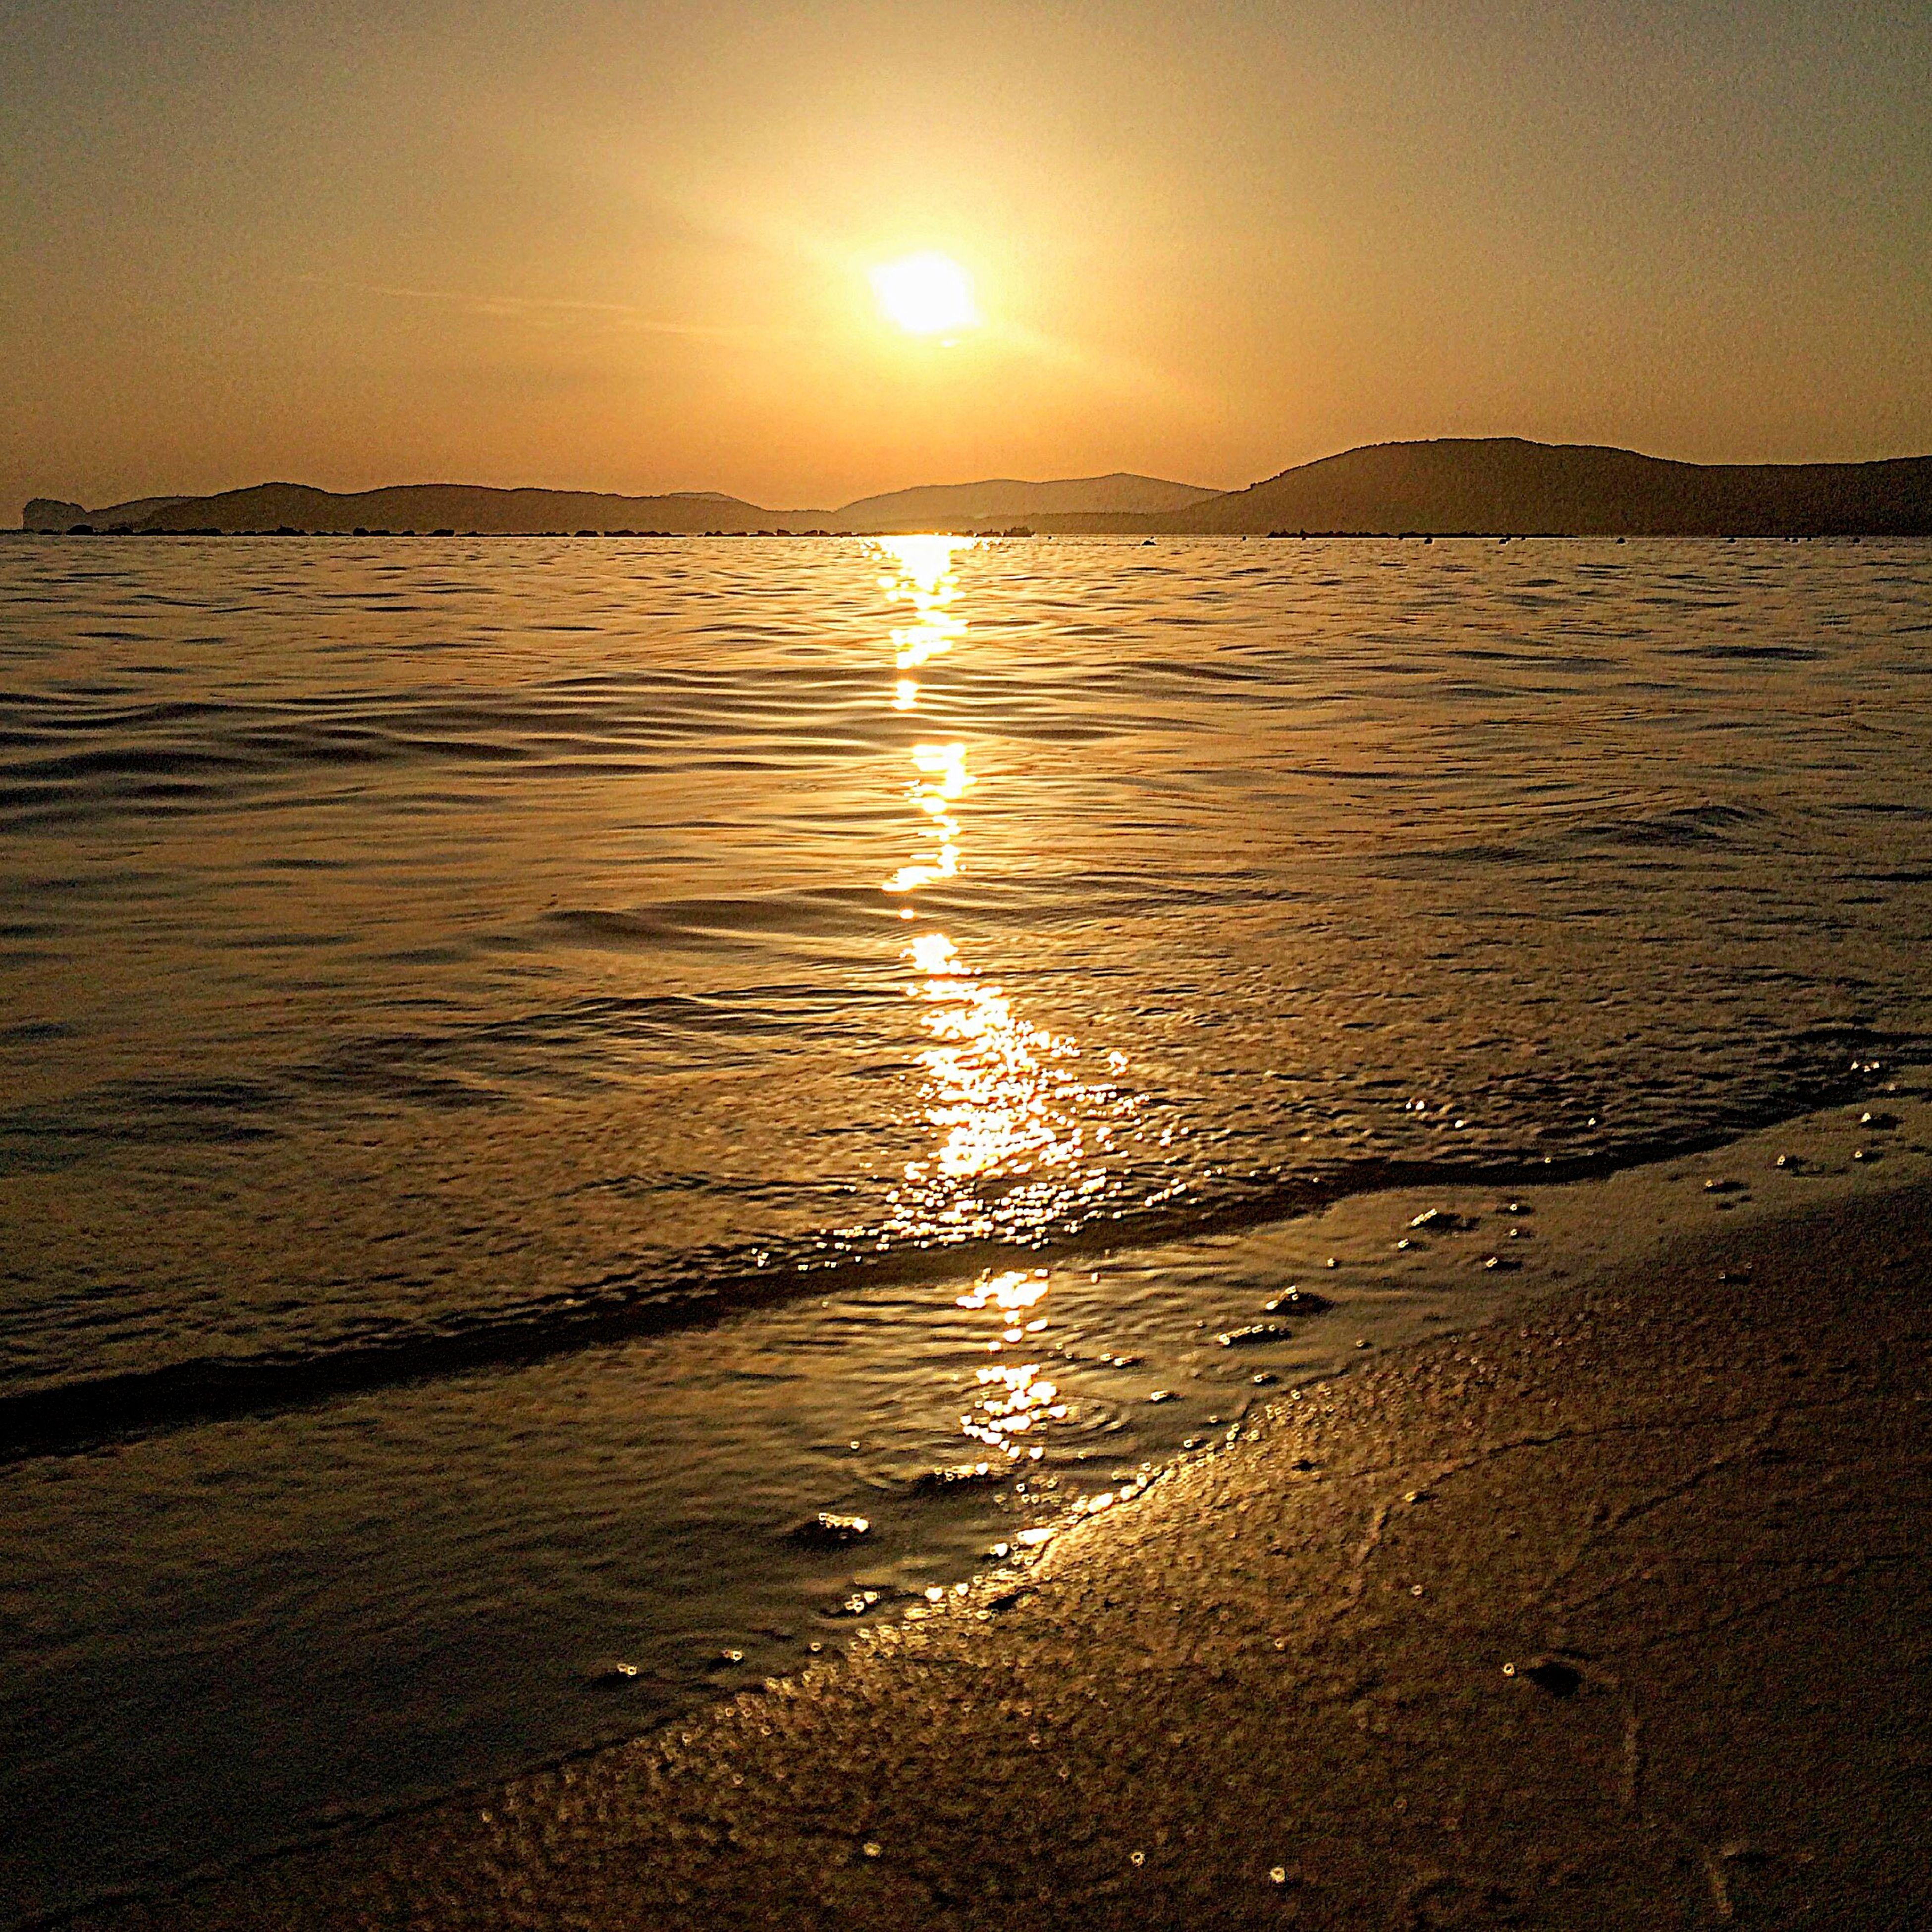 water, sunset, sun, reflection, tranquil scene, scenics, sea, tranquility, beauty in nature, beach, shore, sunlight, nature, orange color, idyllic, sky, silhouette, rippled, sunbeam, sand